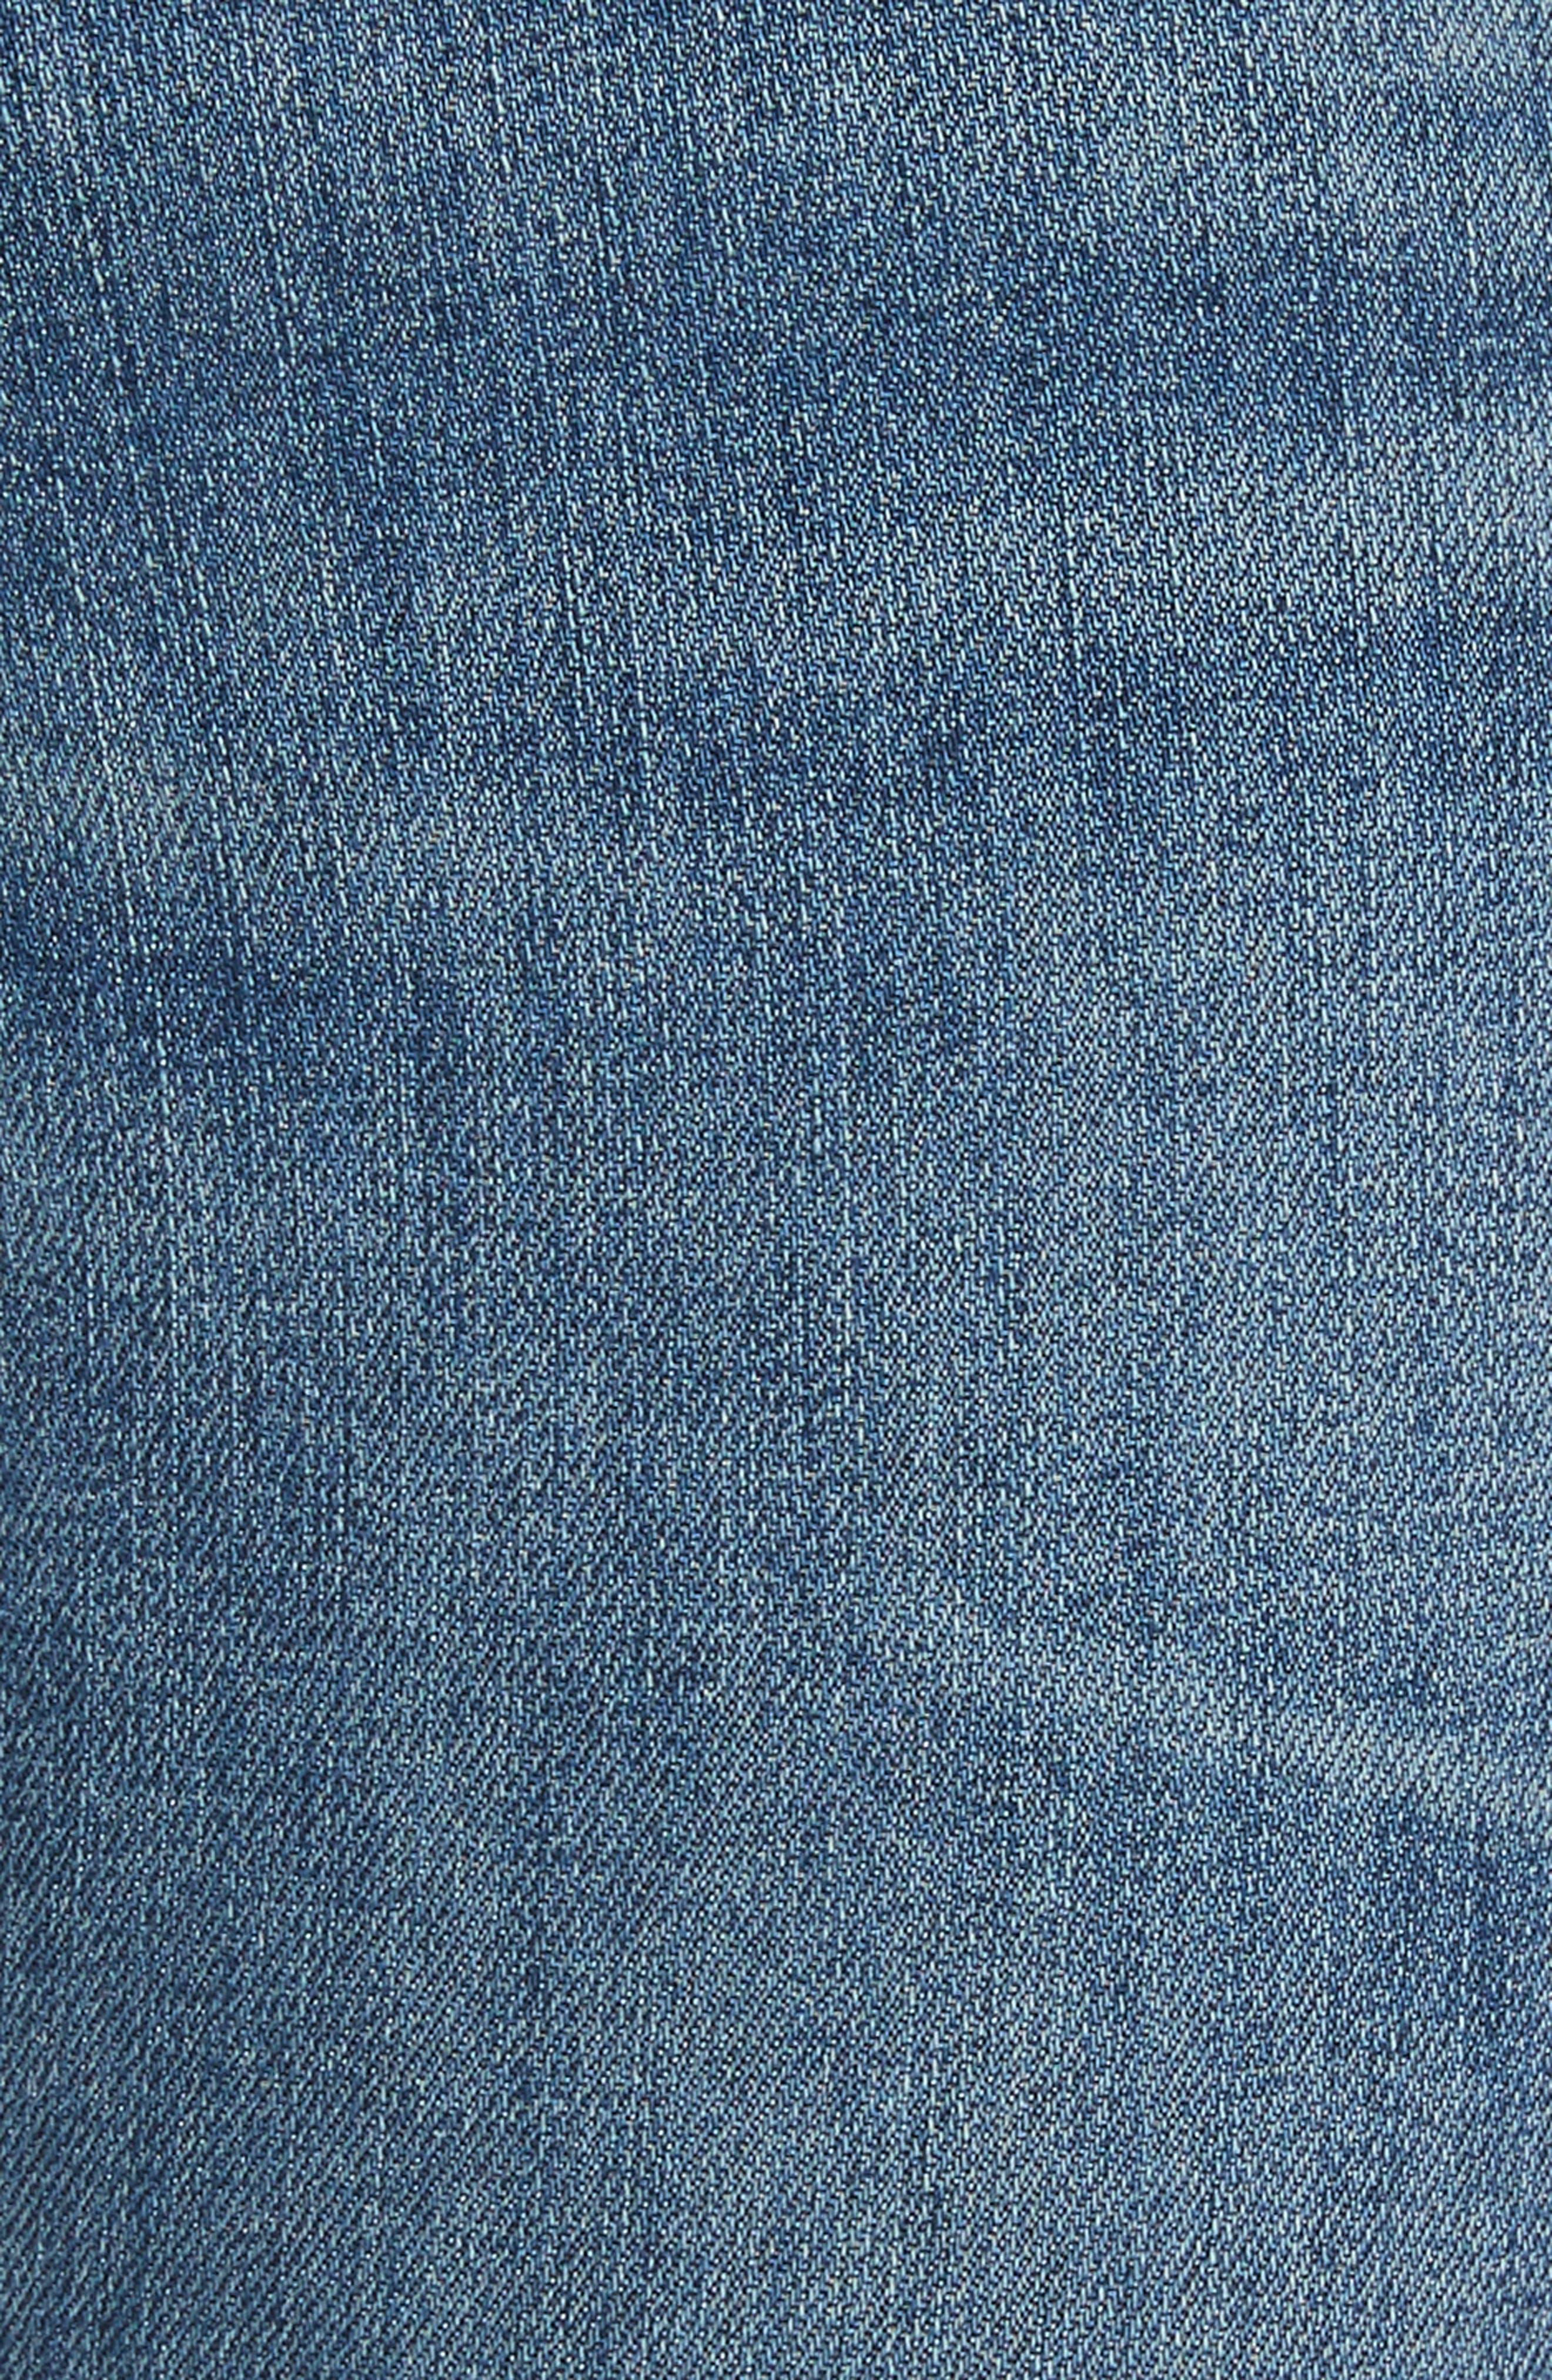 Alternate Image 6  - rag & bone/JEAN Skinny Jeans (Lucky Rouge)